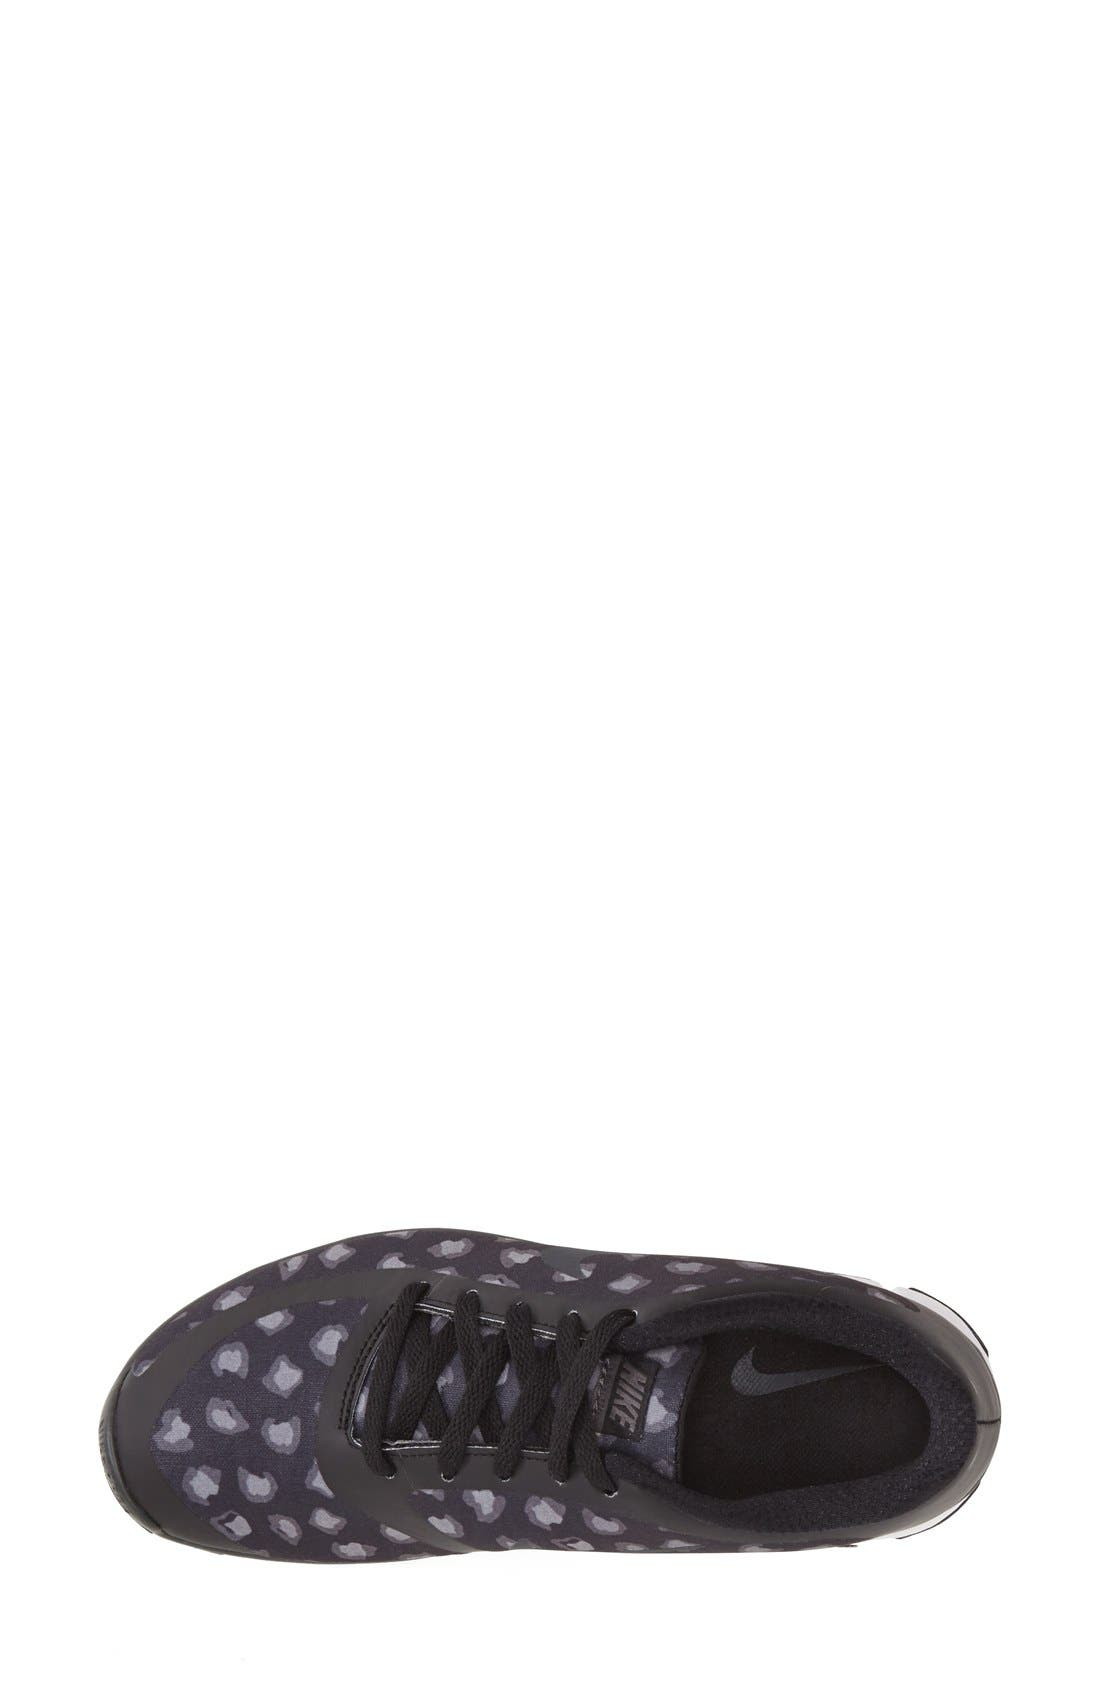 Alternate Image 3  - Nike 'Free 5.0 V4' Running Shoe (Women)